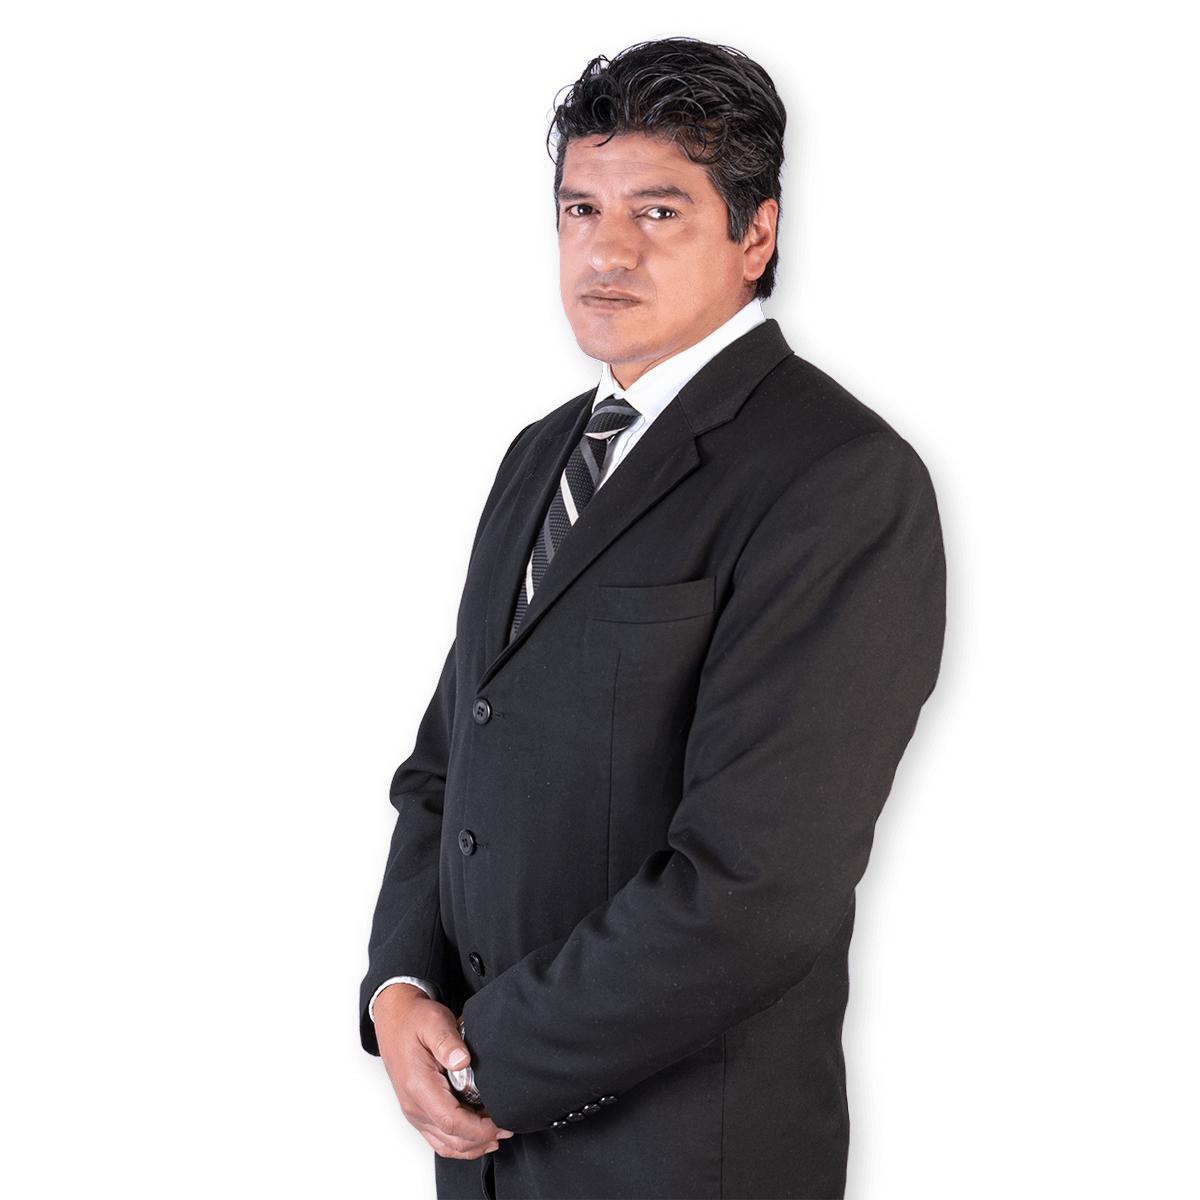 neolab_laboratorio_clinico_Jose_Luis_Sarmiento_team